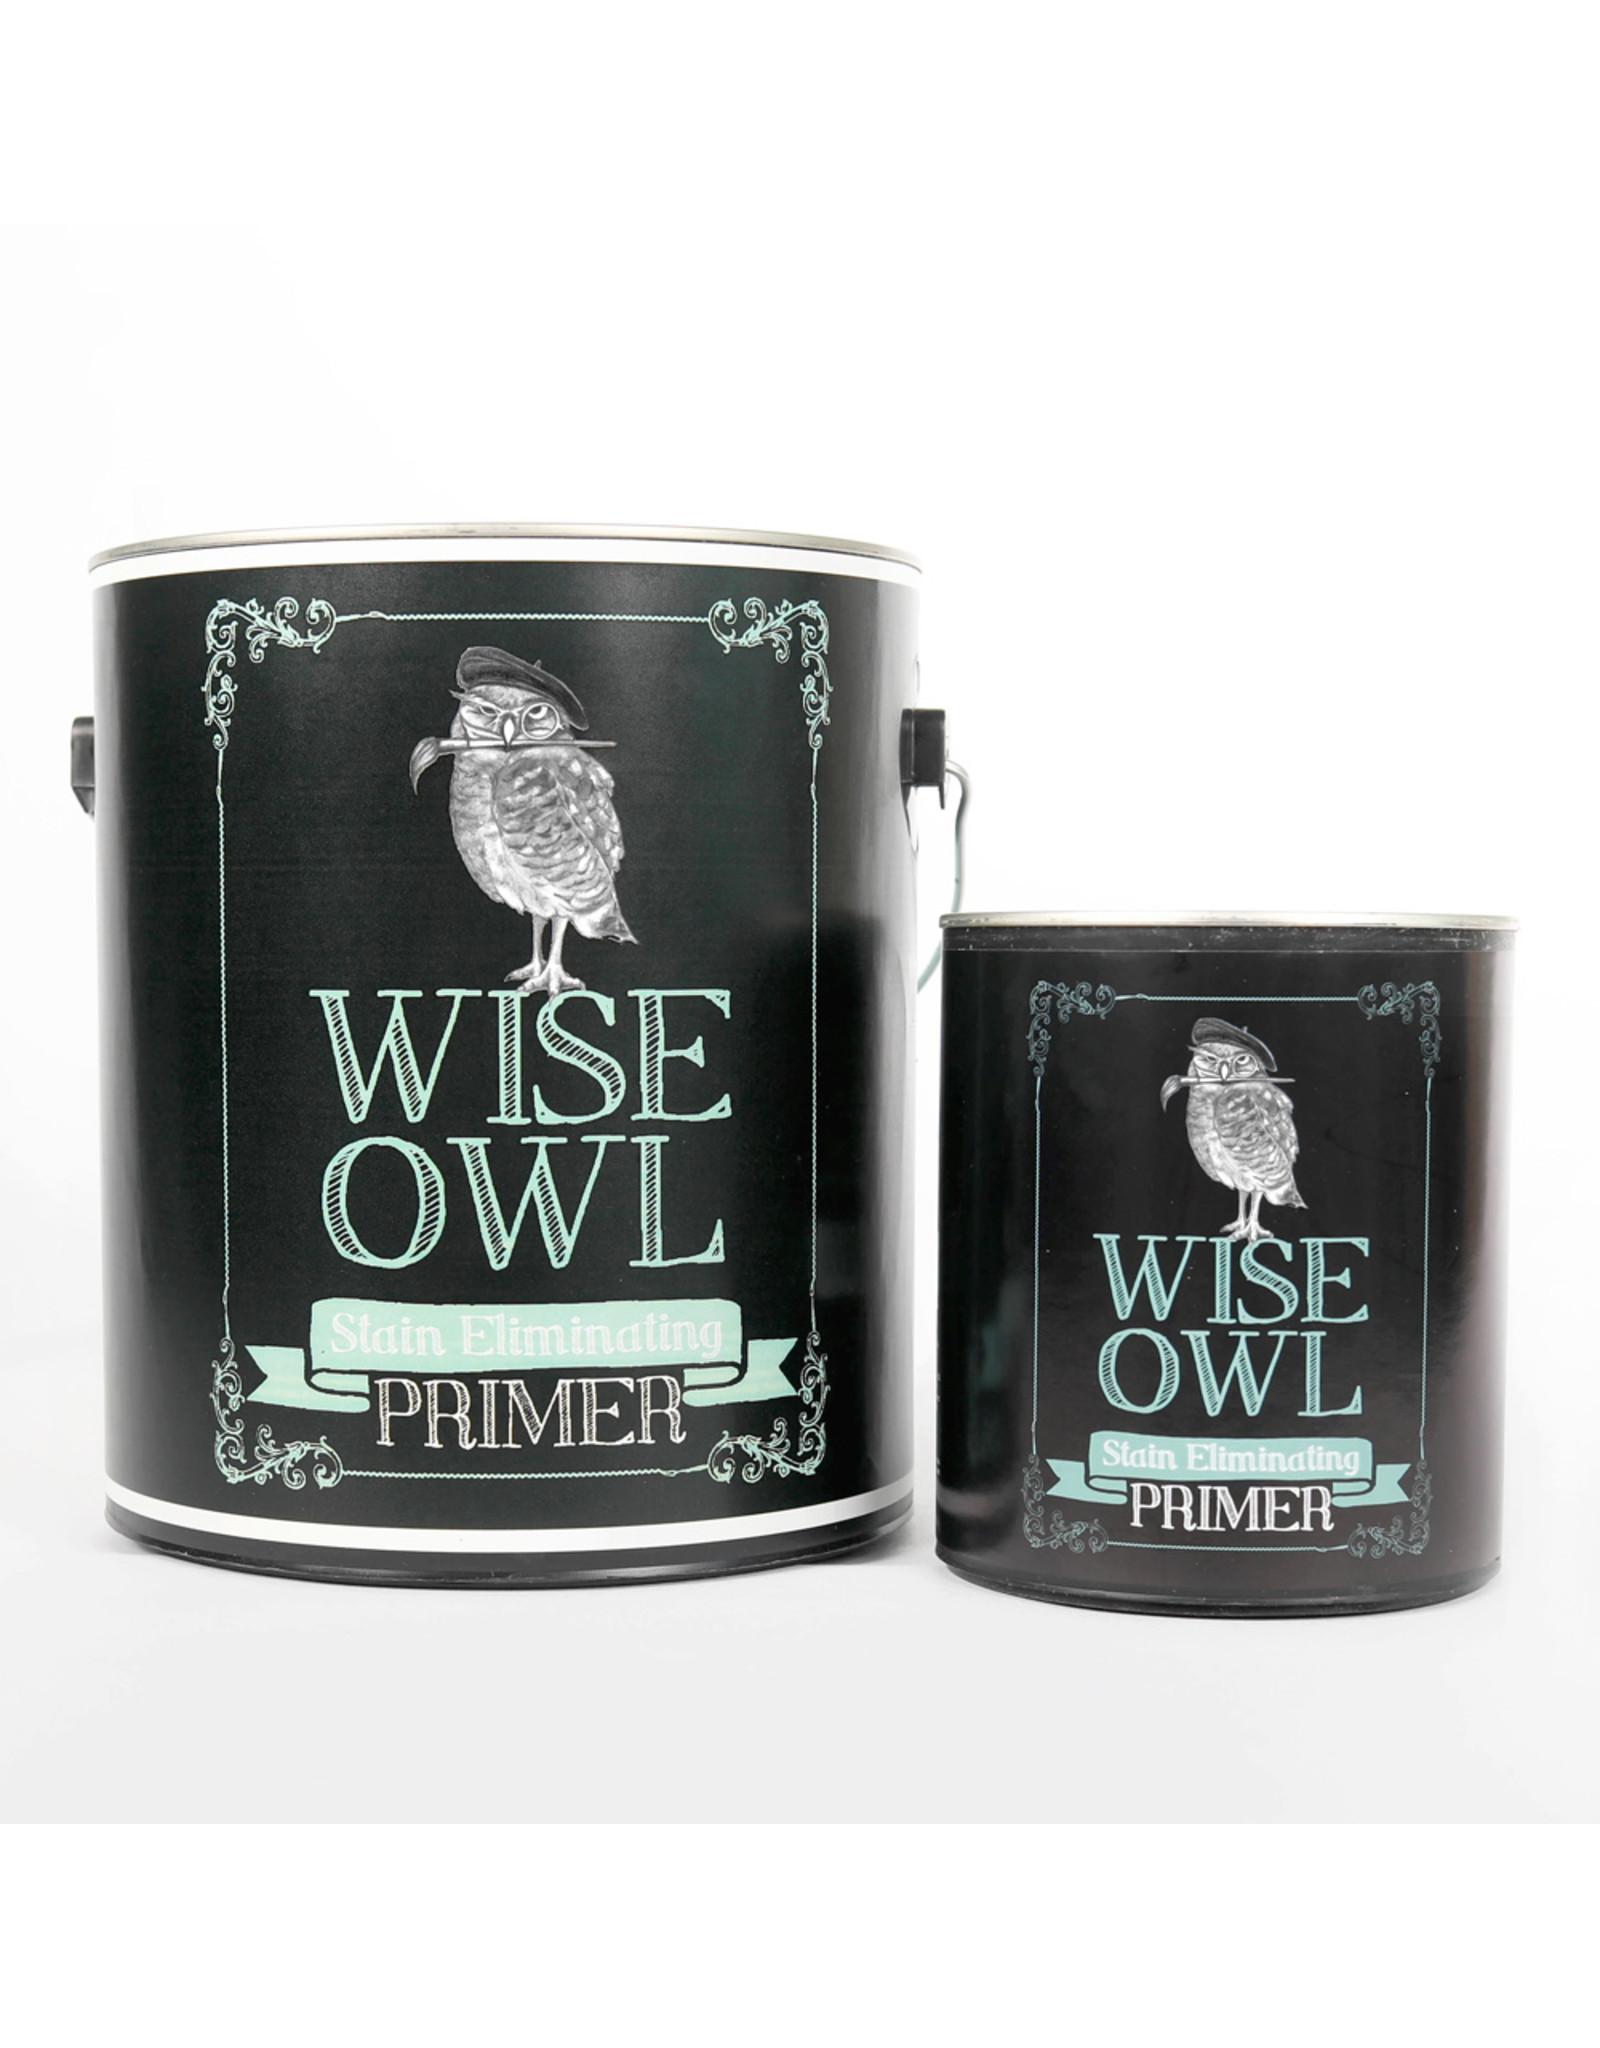 Wise Owl Paint Stain Eliminating Primer Gray-Quart